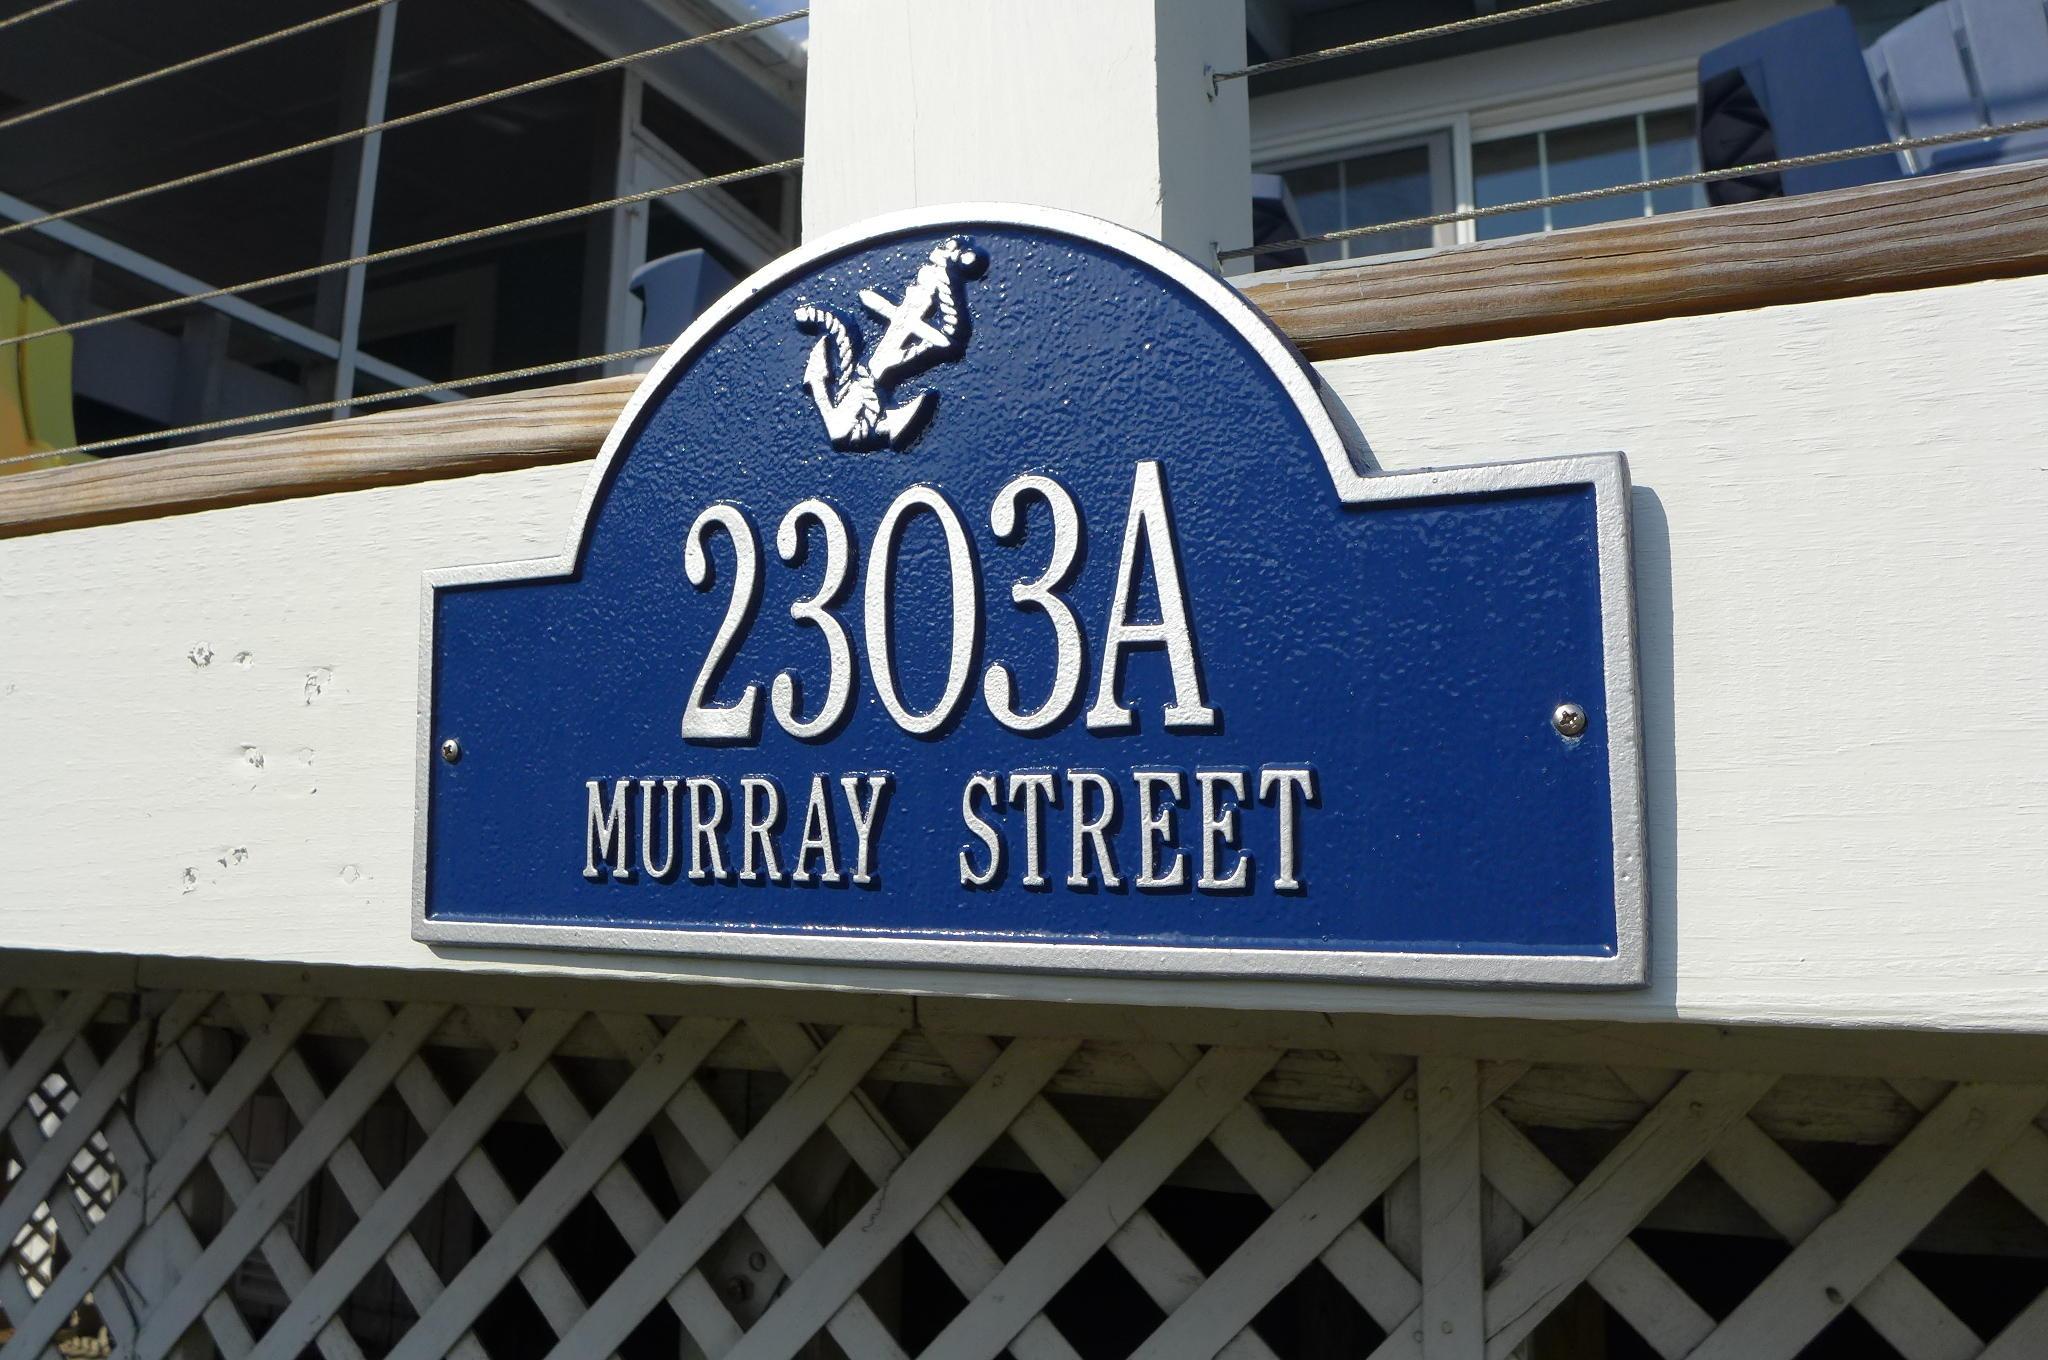 2303-A Murray Street Edisto Beach, SC 29438